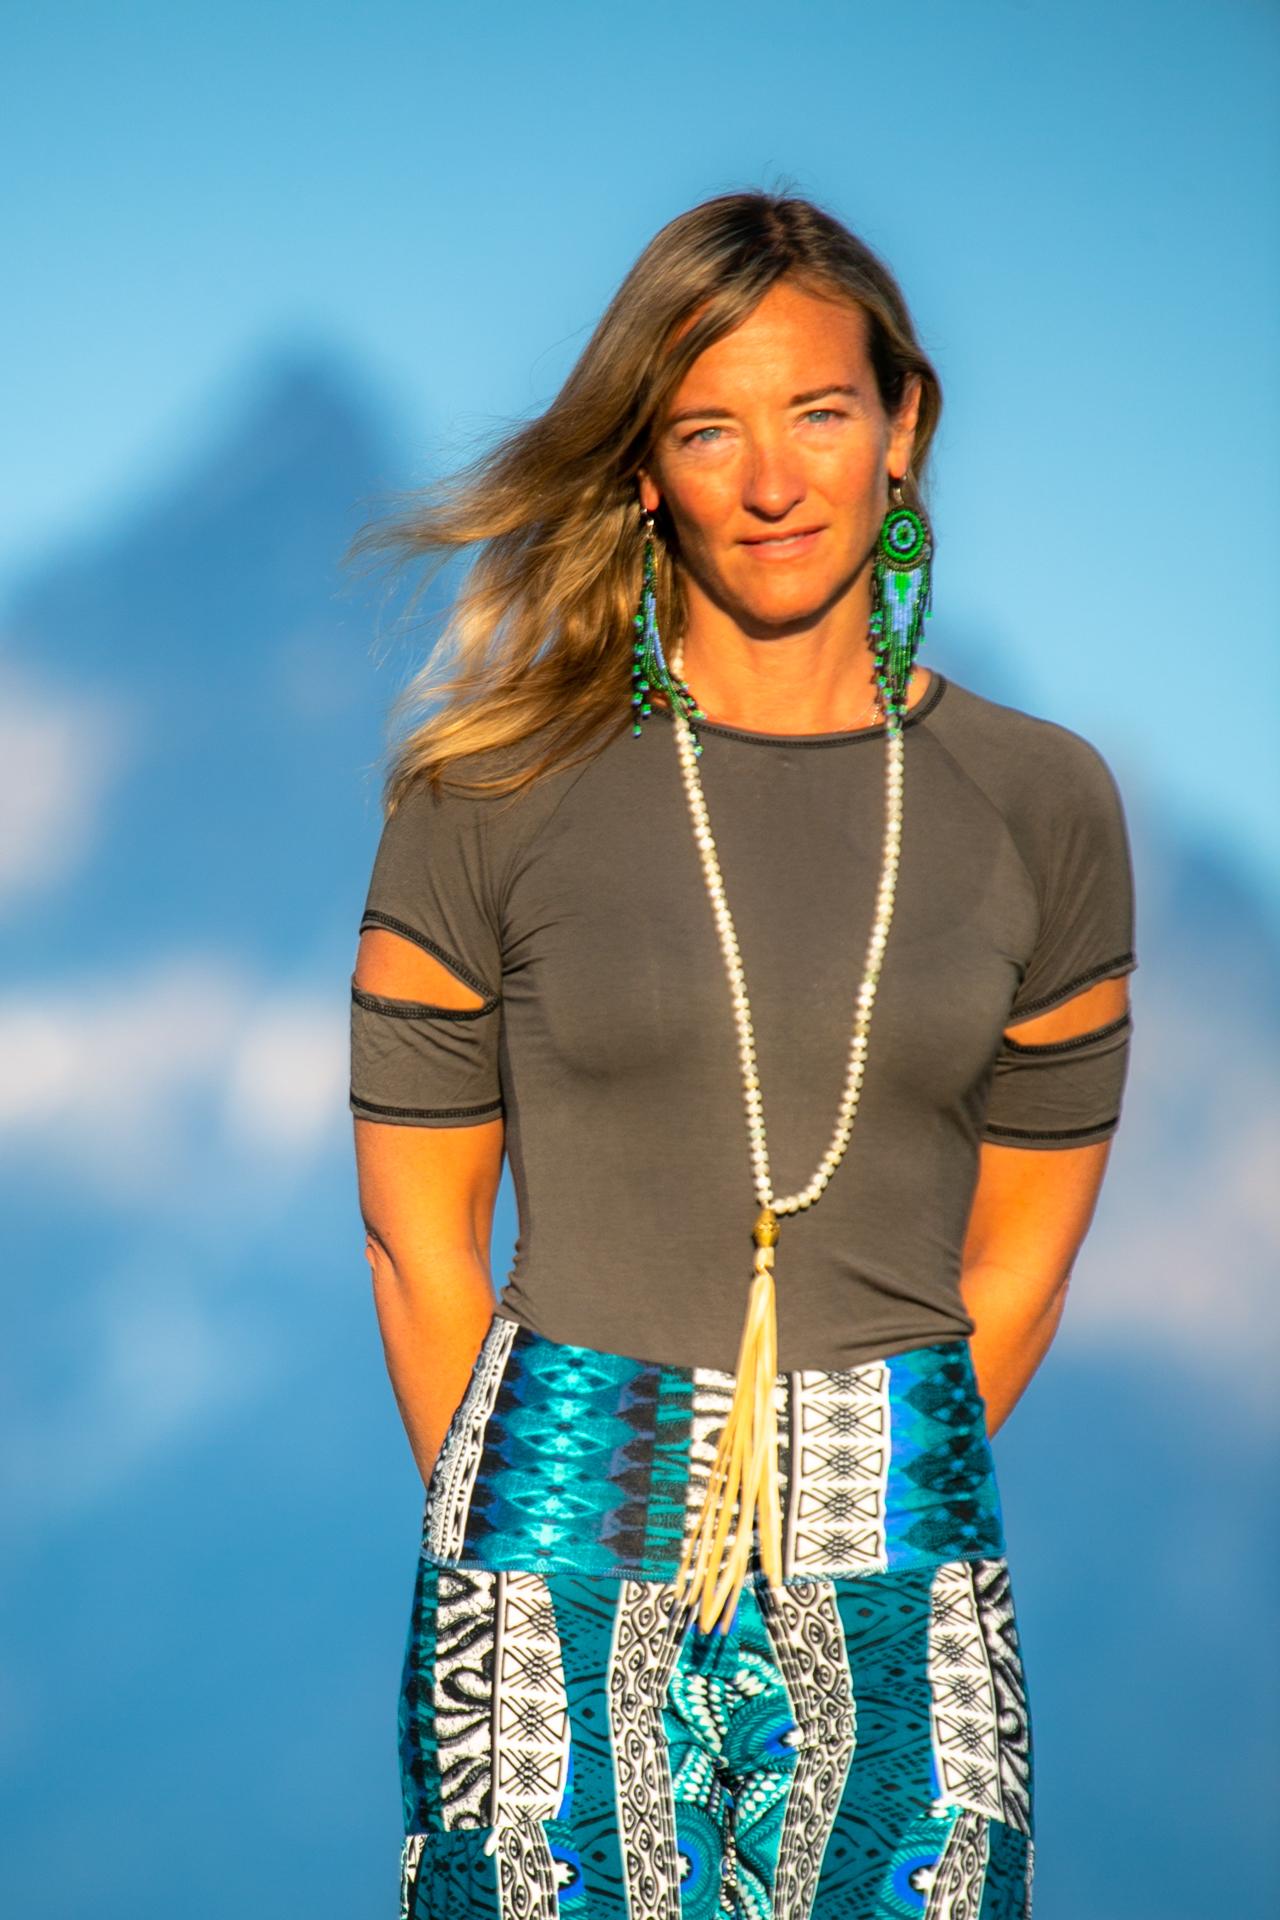 Fashion designer Autumn Teneyl wearing a short sleeved top in the Teton Mountains in Wyoming.